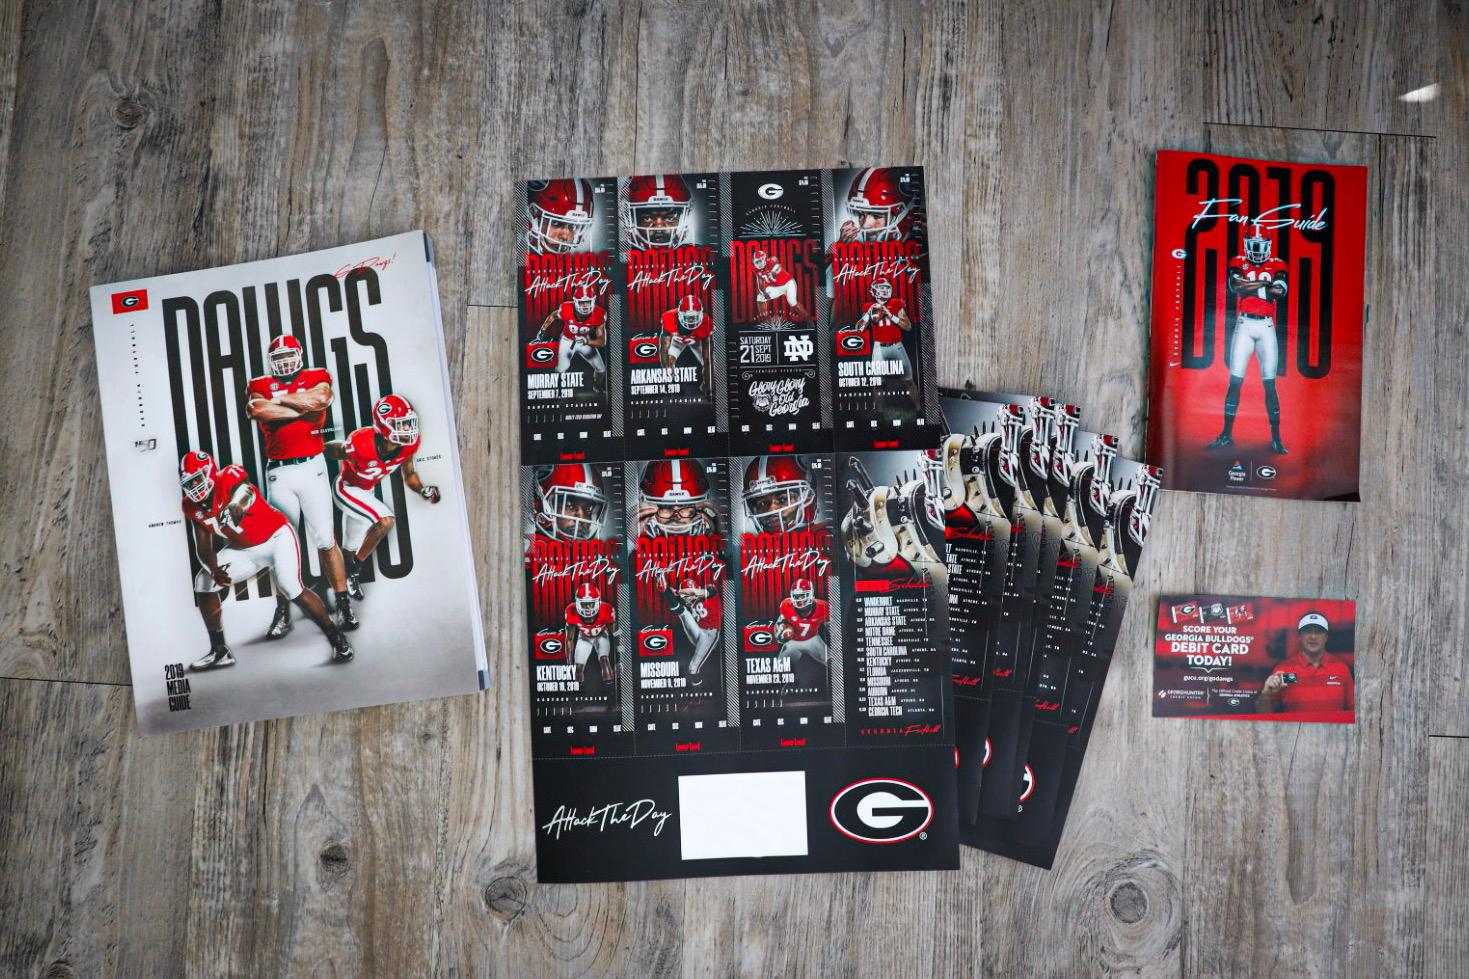 The 2019 Georgia Bulldogs Season Tickets | #AttackTheDay